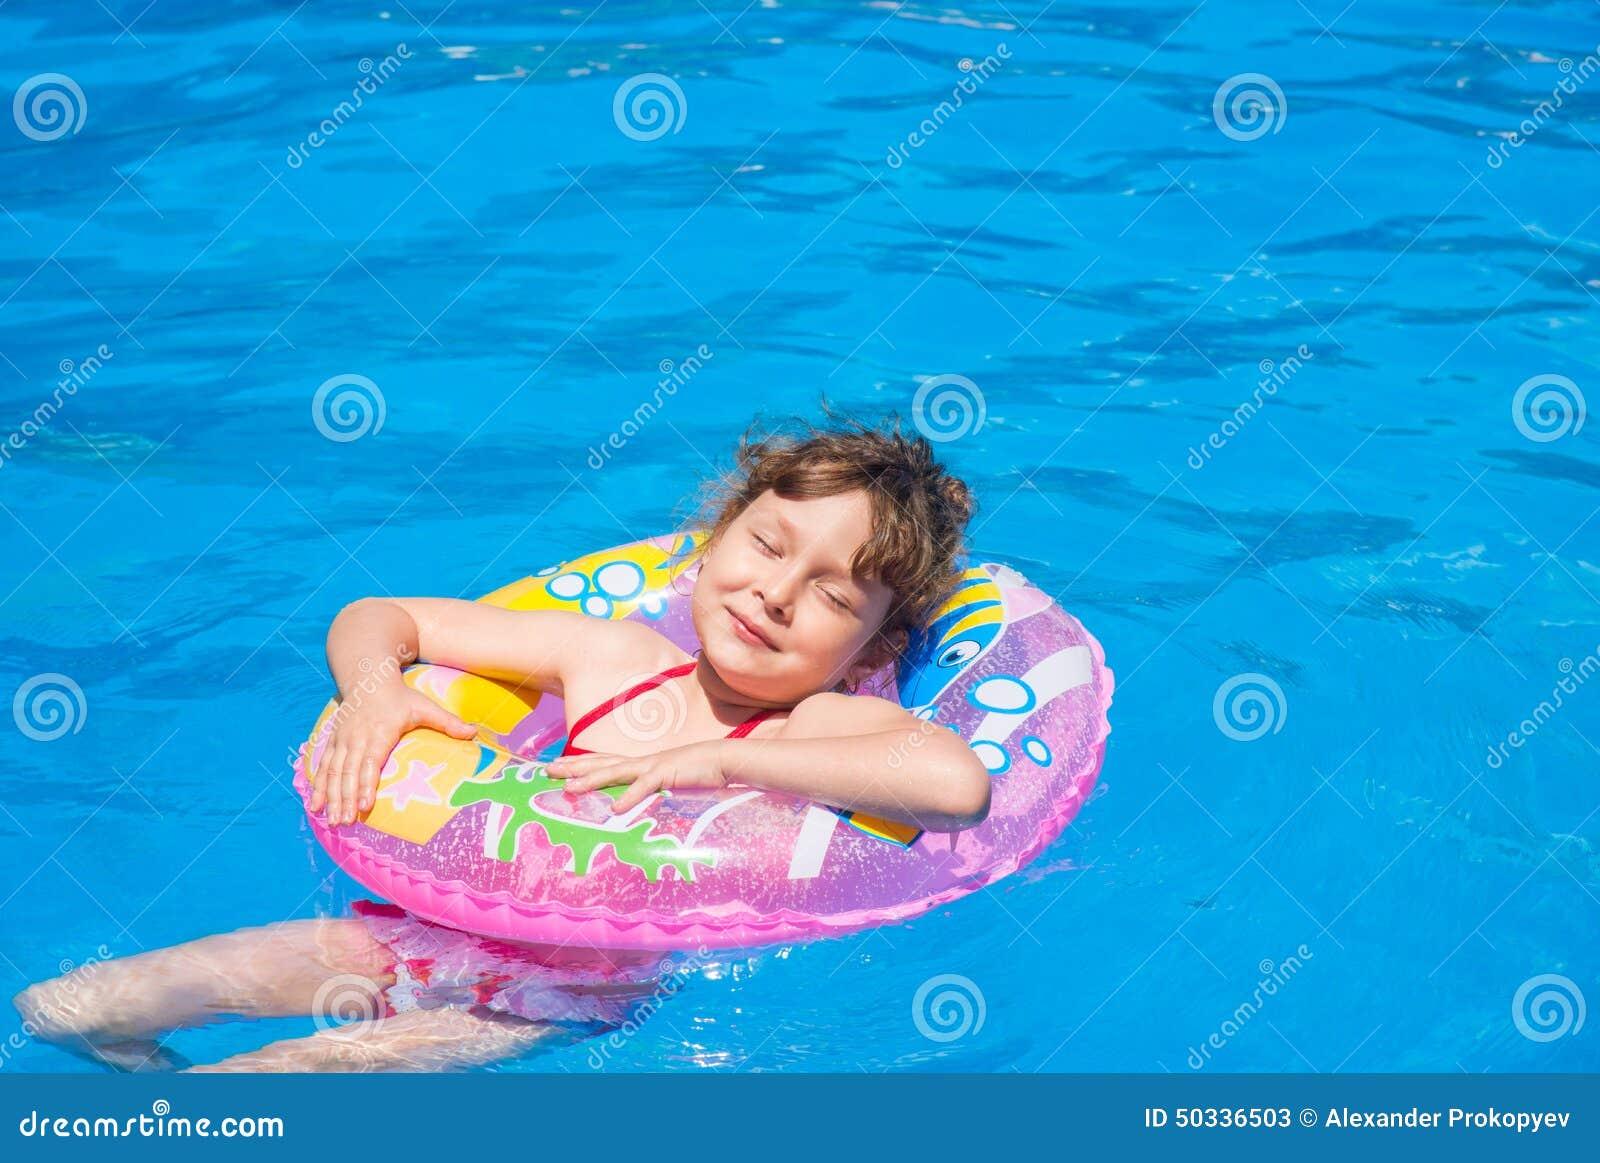 Valuable message Sweet girls swim pool